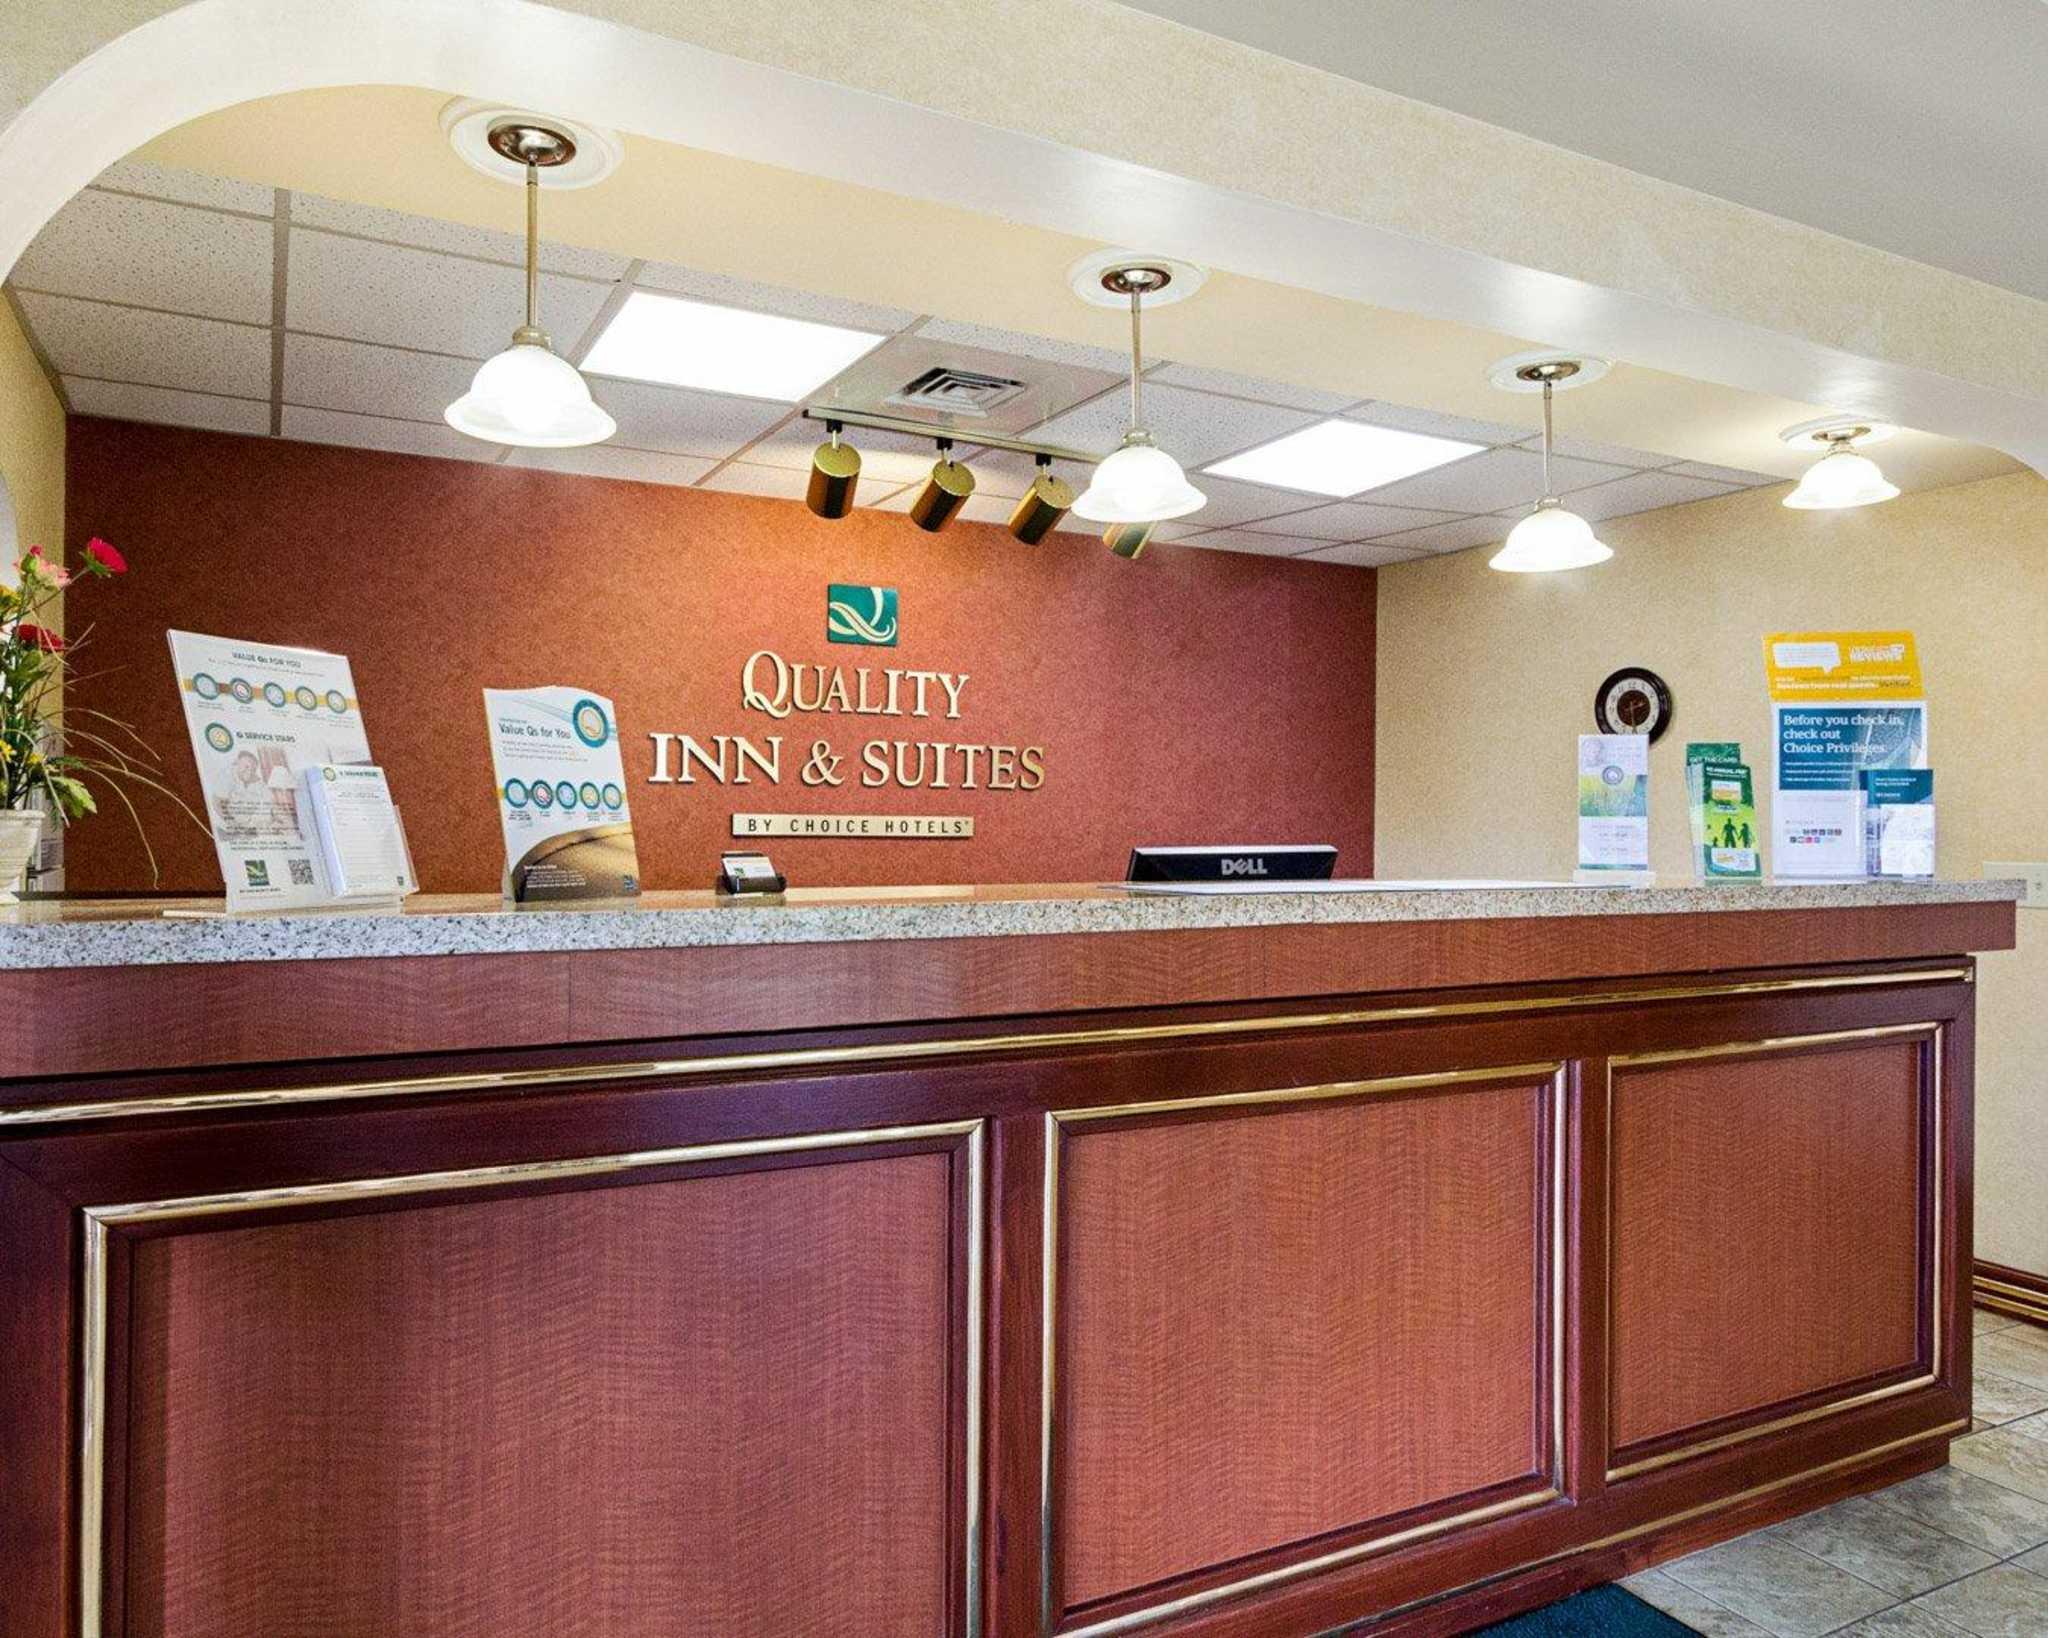 Quality Inn & Suites Southwest image 19